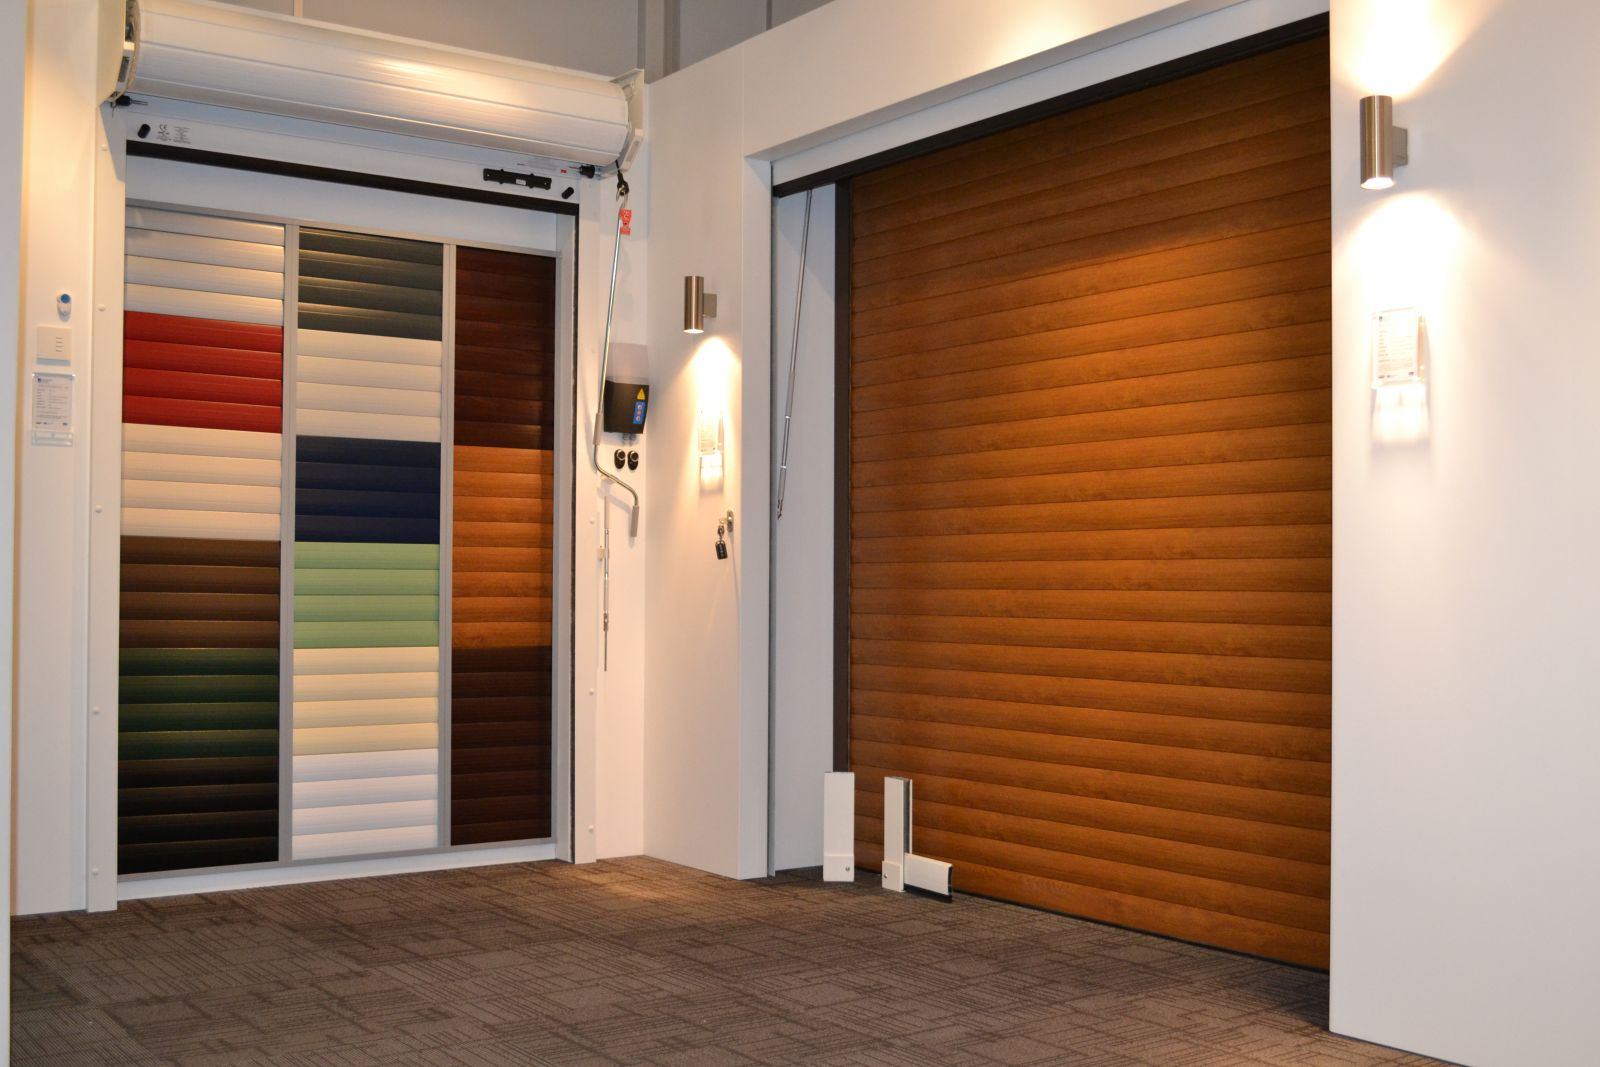 Personal Showroom Garage : Asfordby doors showroom door specialists based in leicester